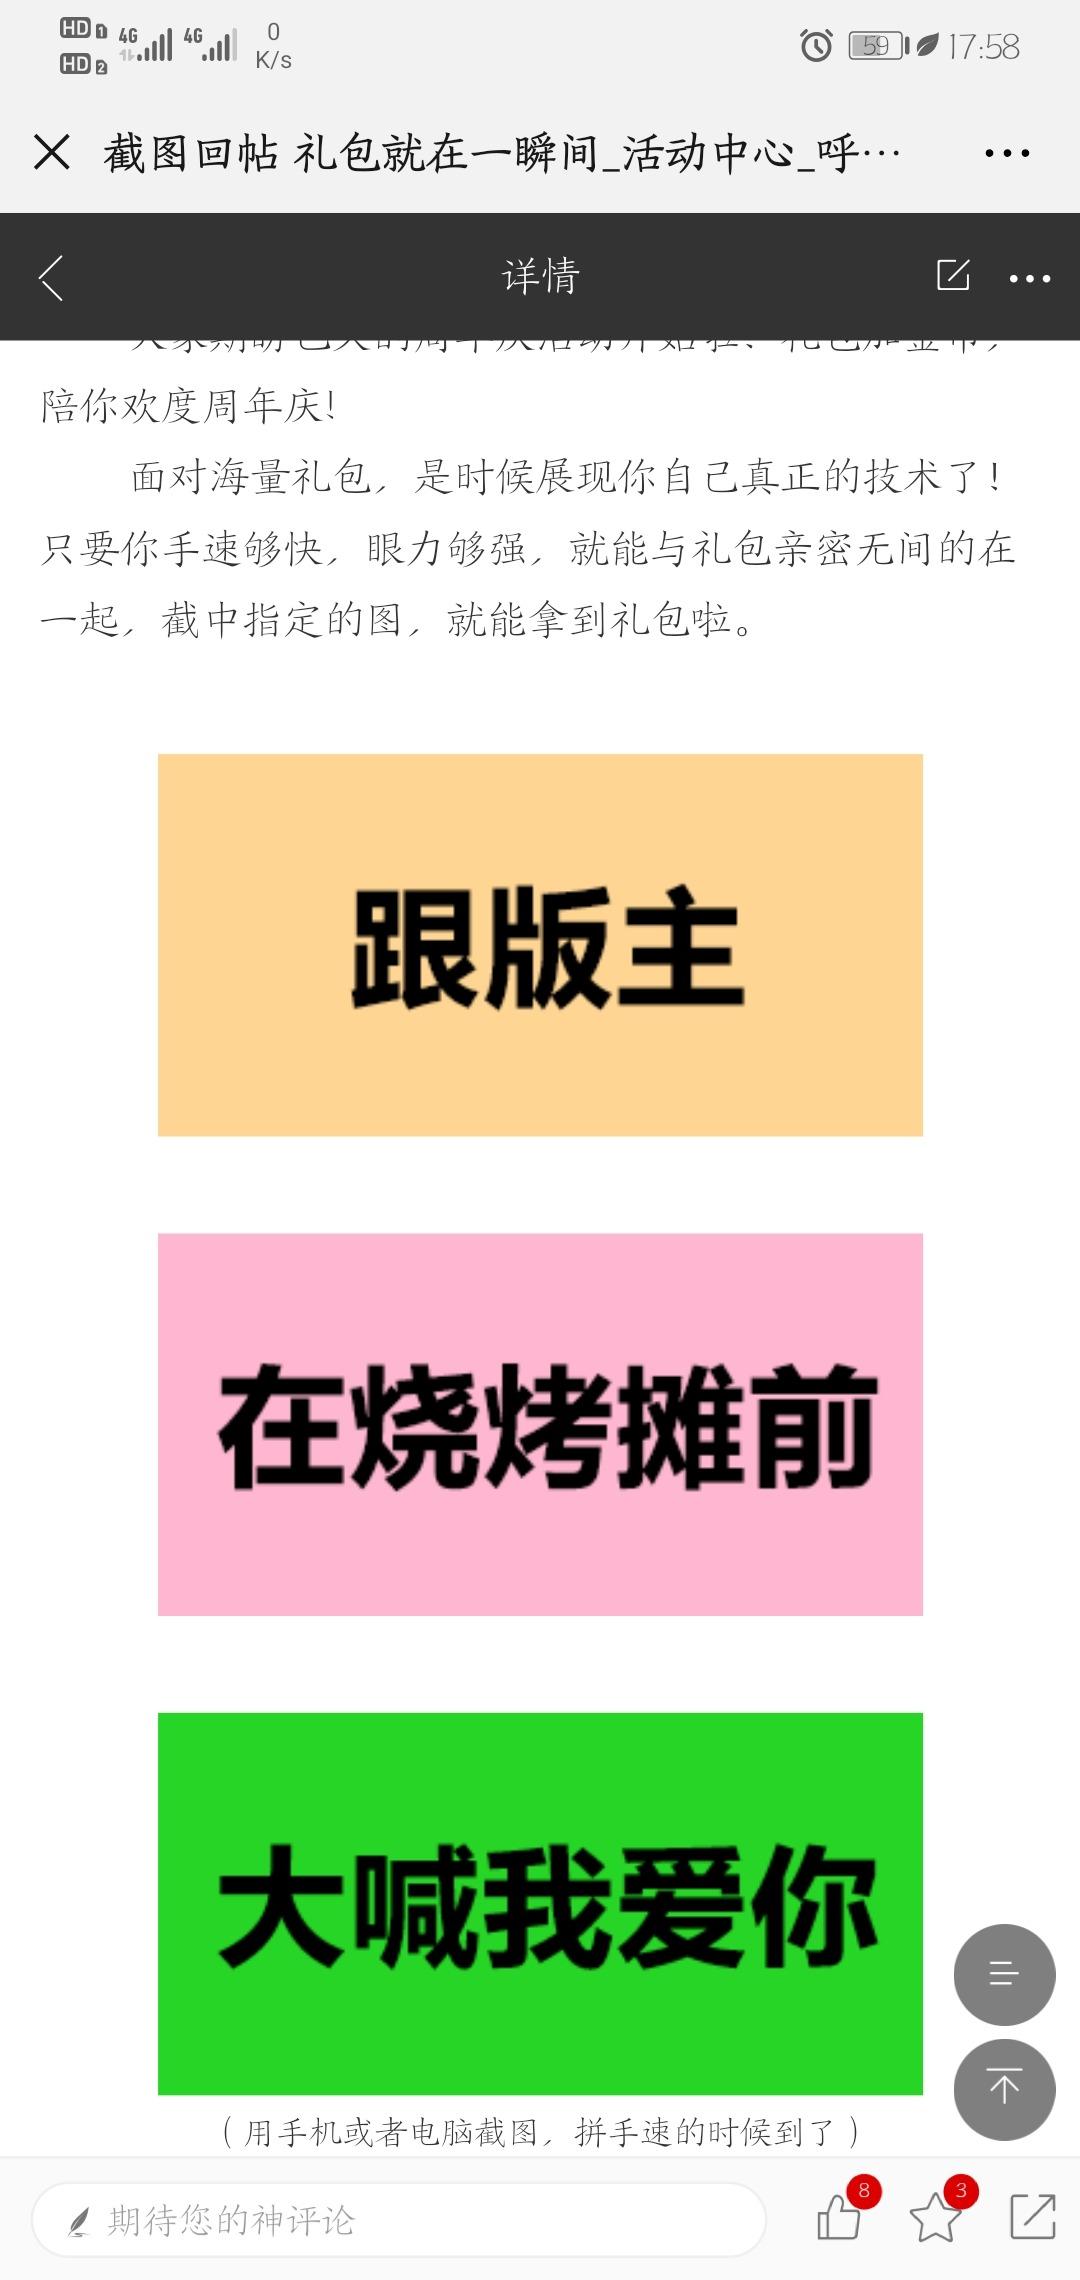 Screenshot_20190725_175833_com.tencent.mm.jpg